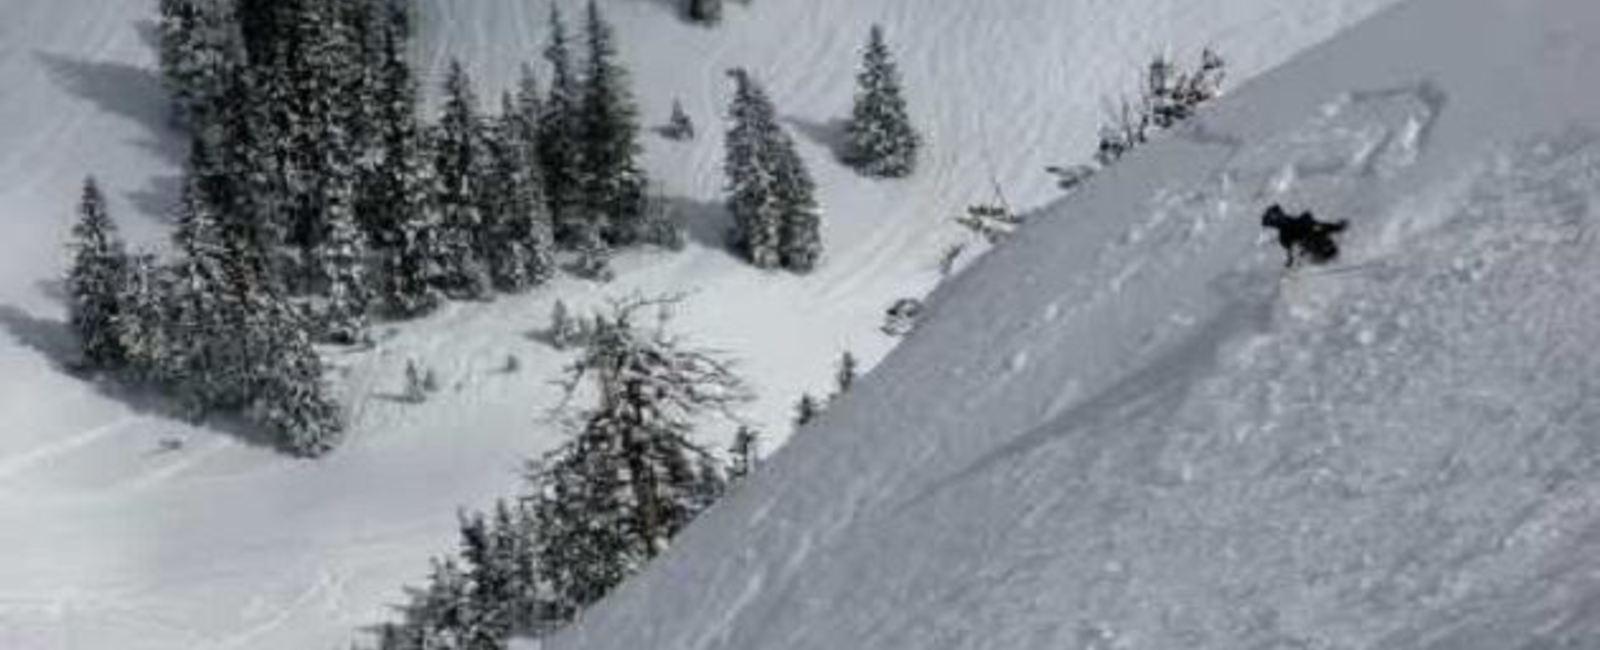 Patrolling Fantasy Ridge - Solitude Avalanche Control